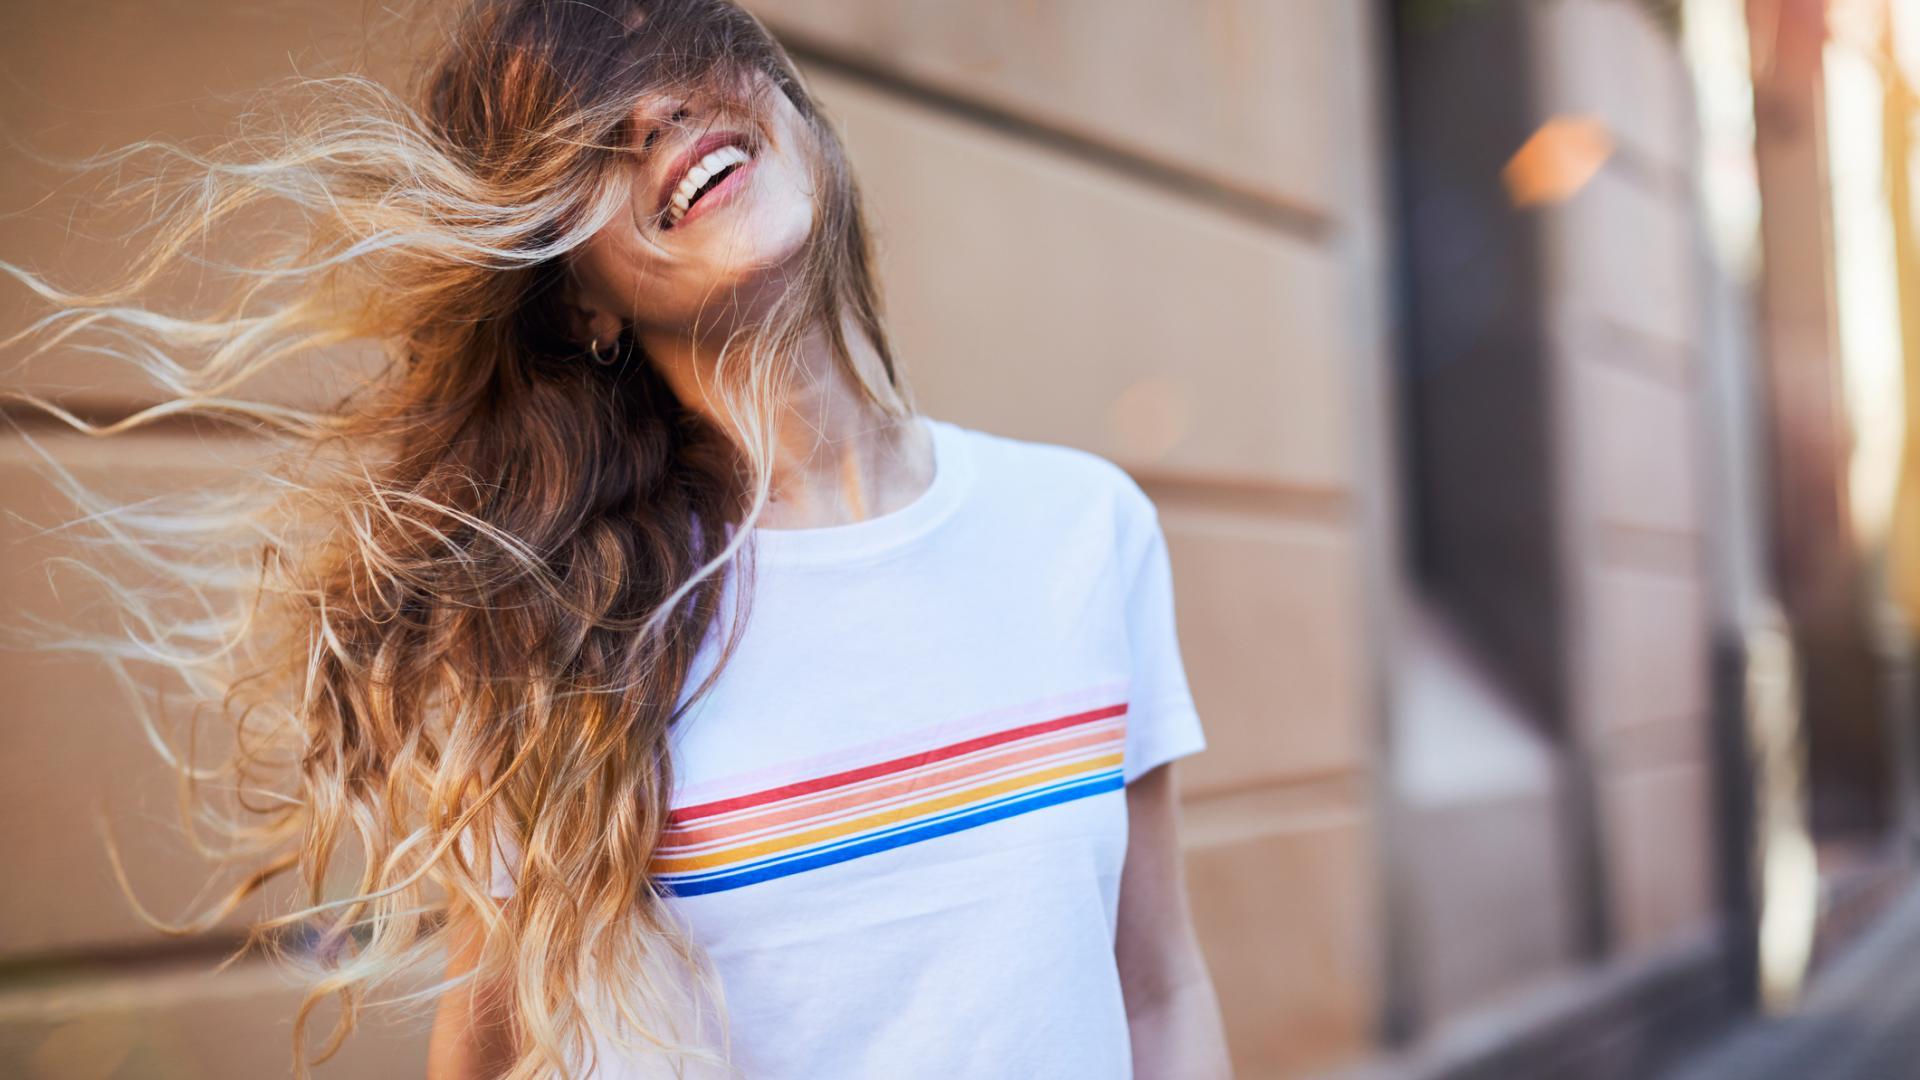 Ansatz rauswachsen lassen haare hipster frau